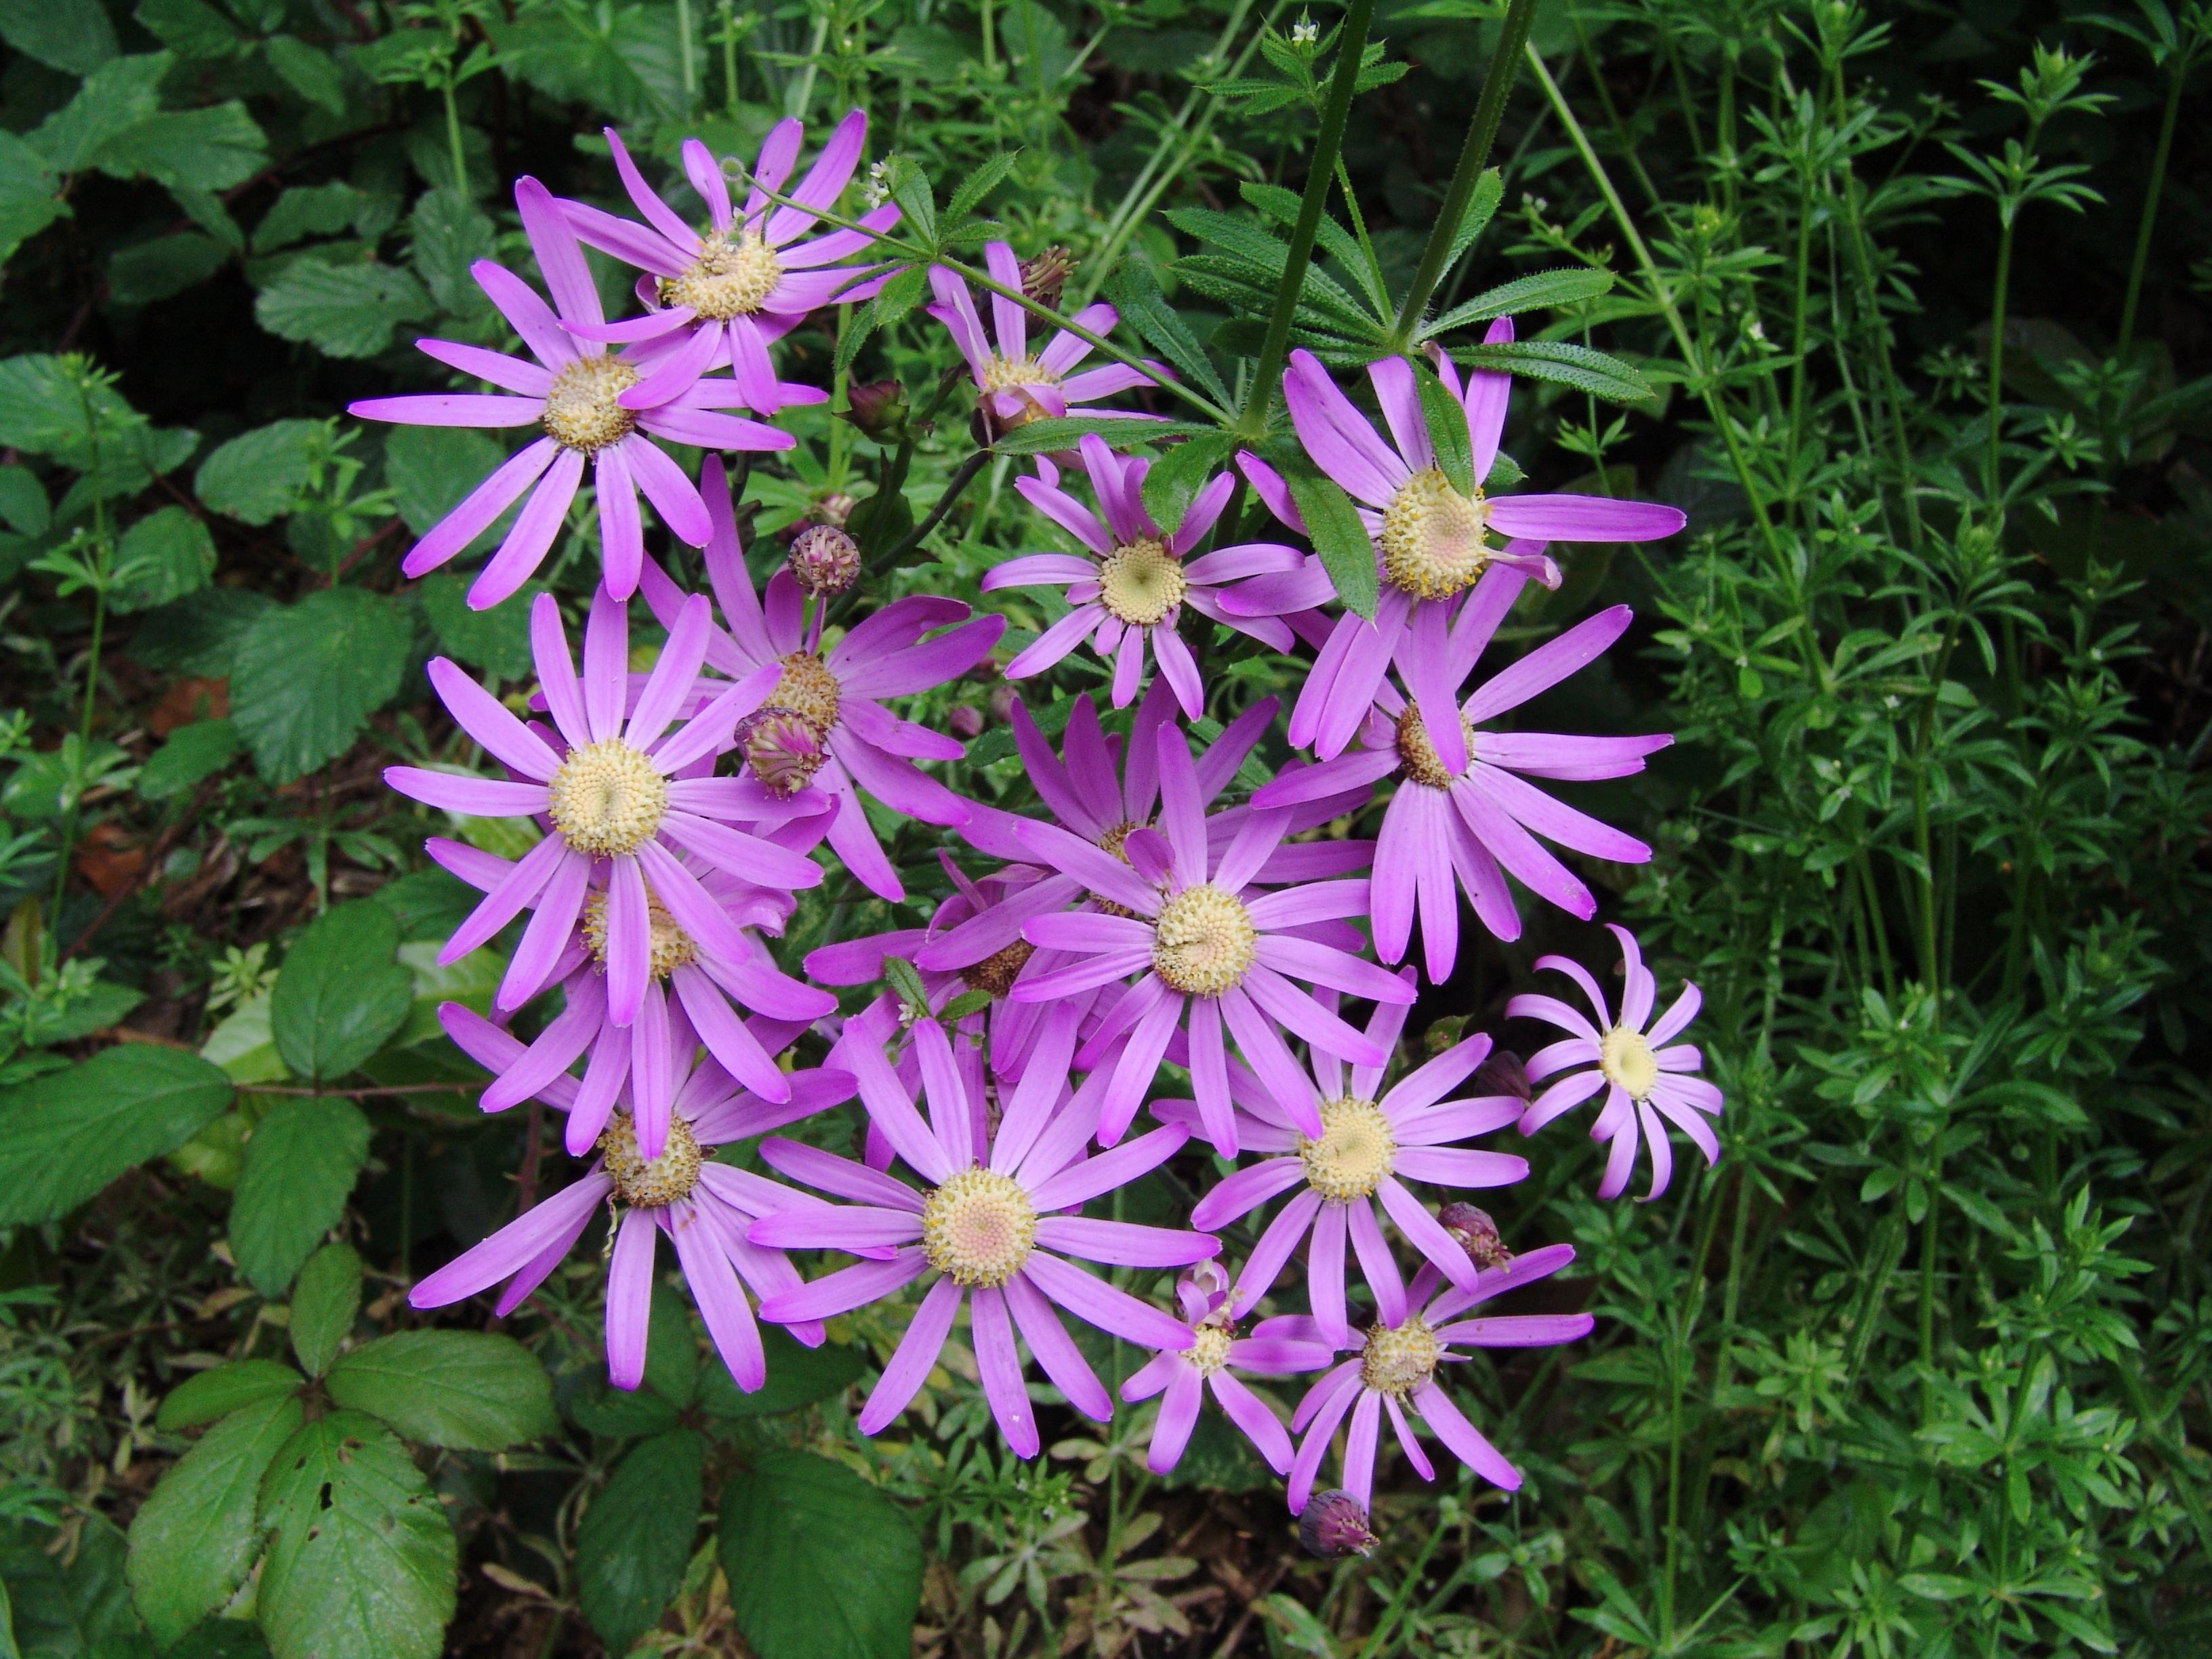 dsc08654-pericallis-tusilaginis-flora-10.jpg